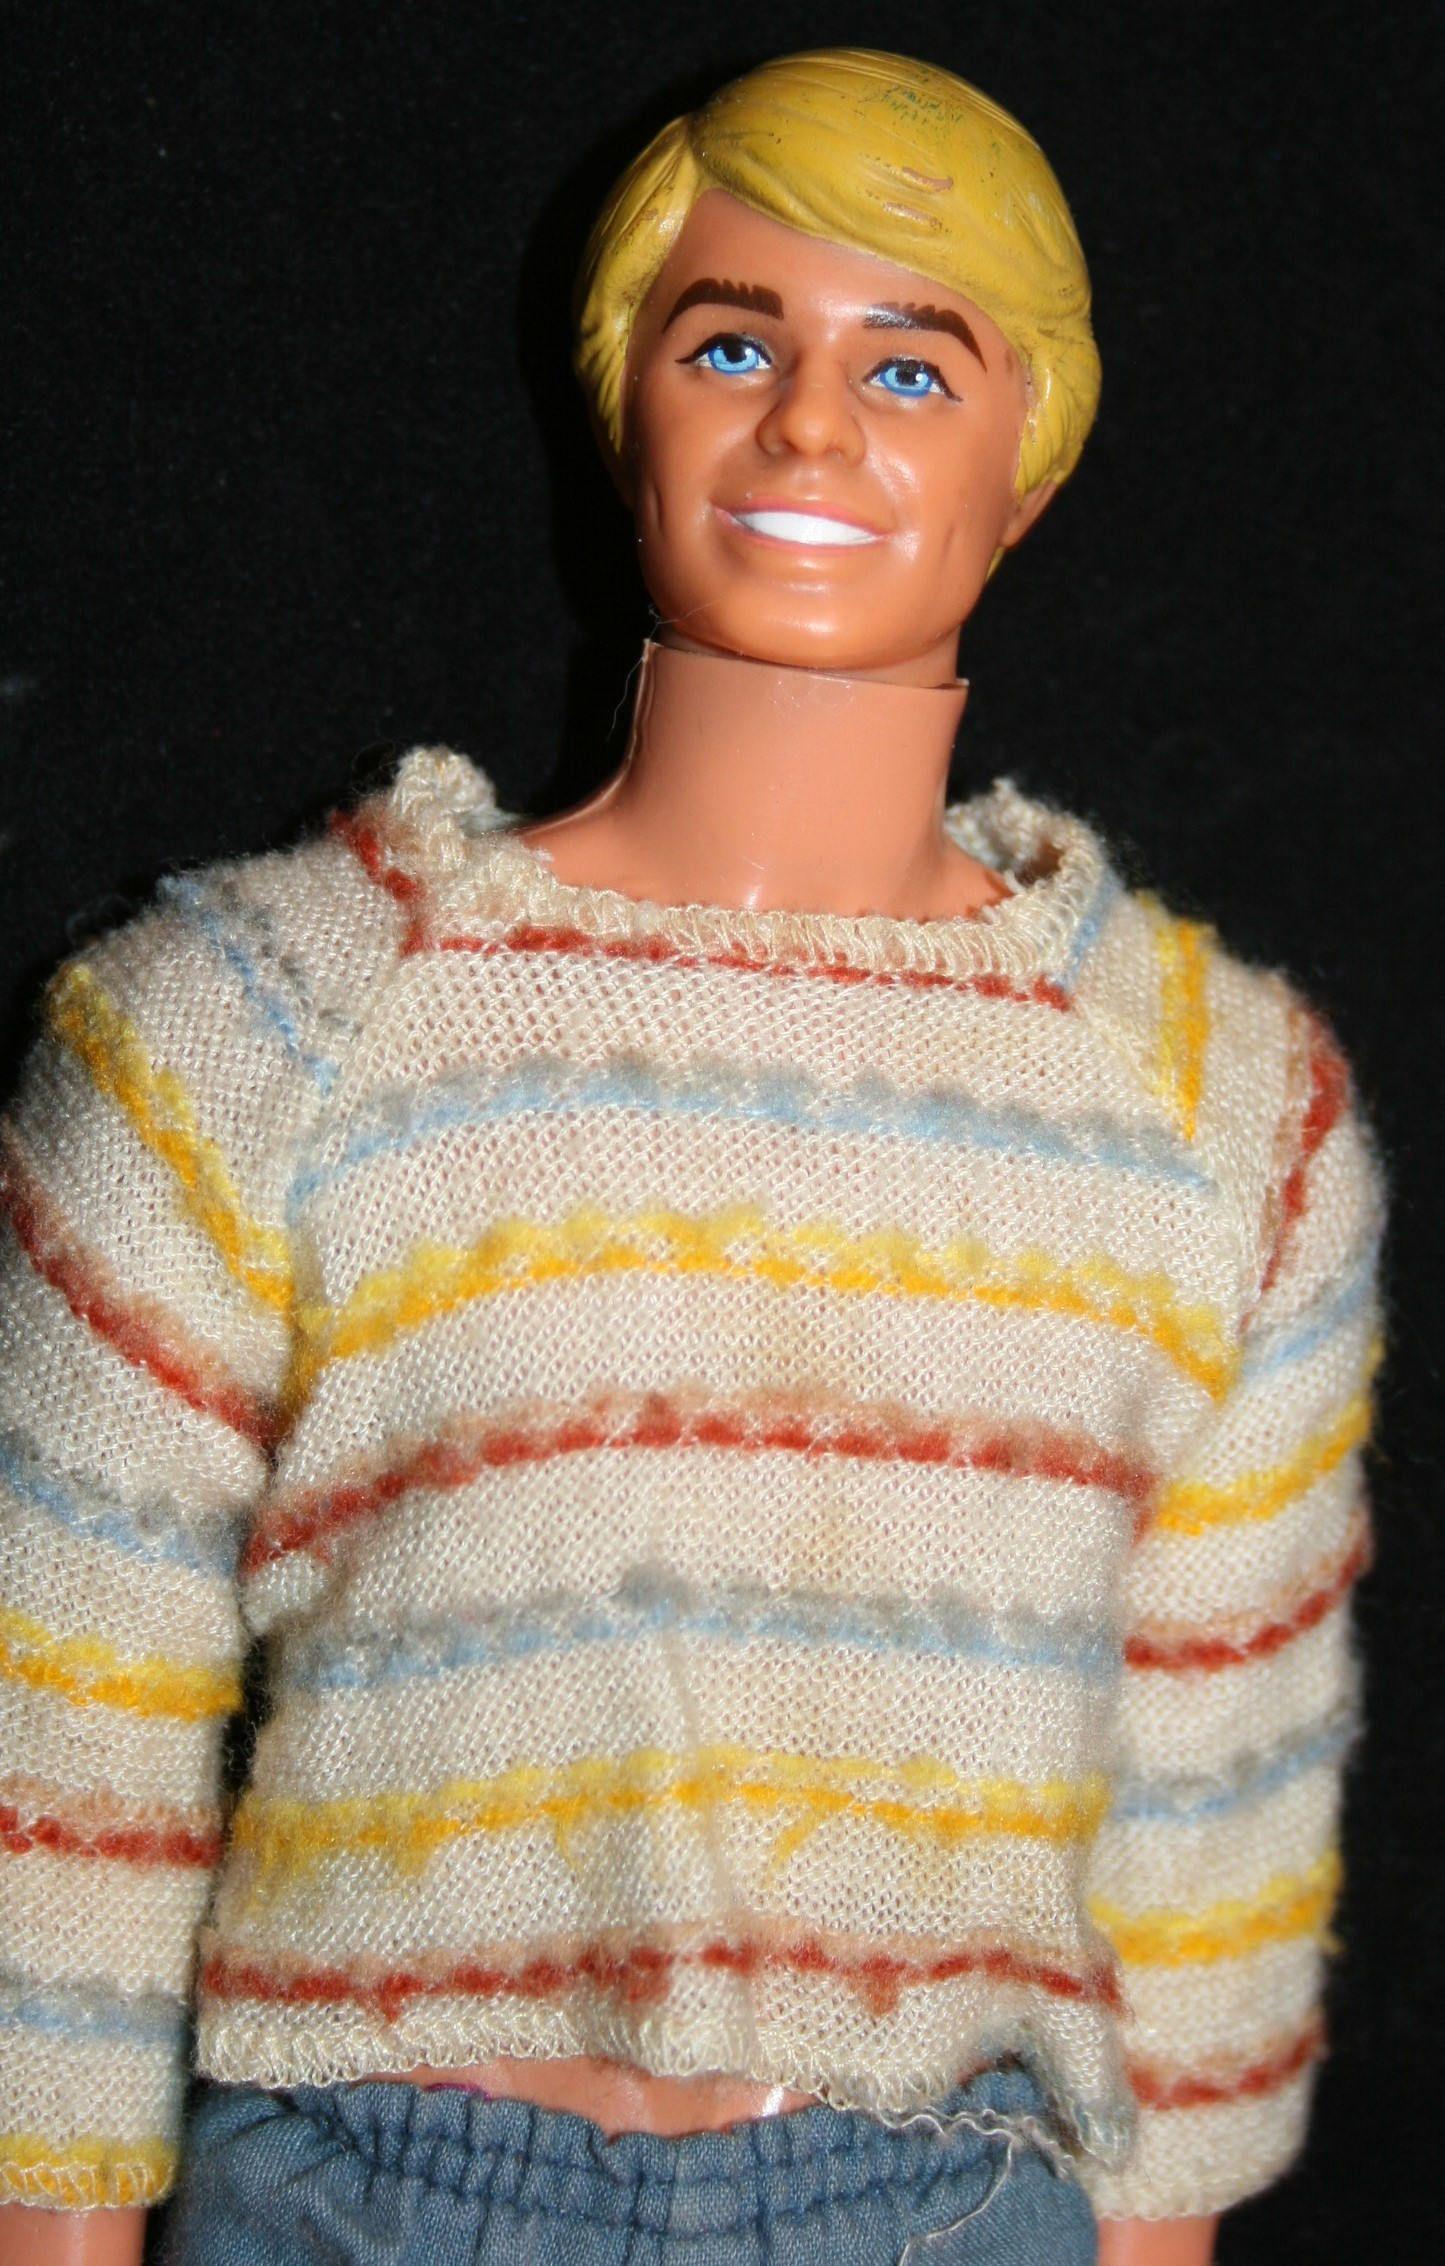 Mattel Barbie Ken Doll Blonde Hair Blue Eyes